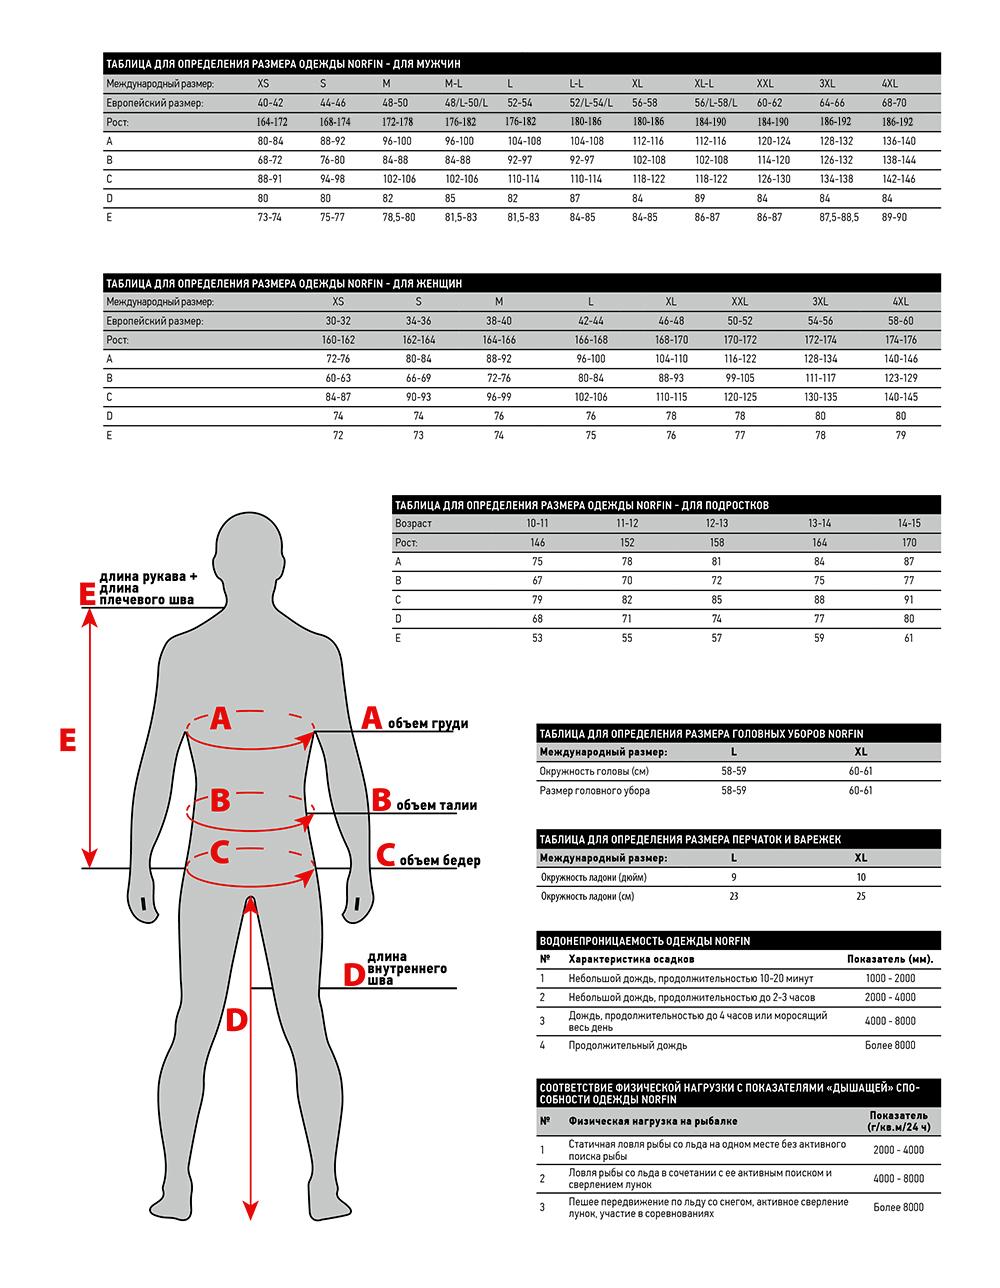 Таблица_размеров_Норфин_dfe88cd77a4568af689cbdad7a0c3dc8.jpg